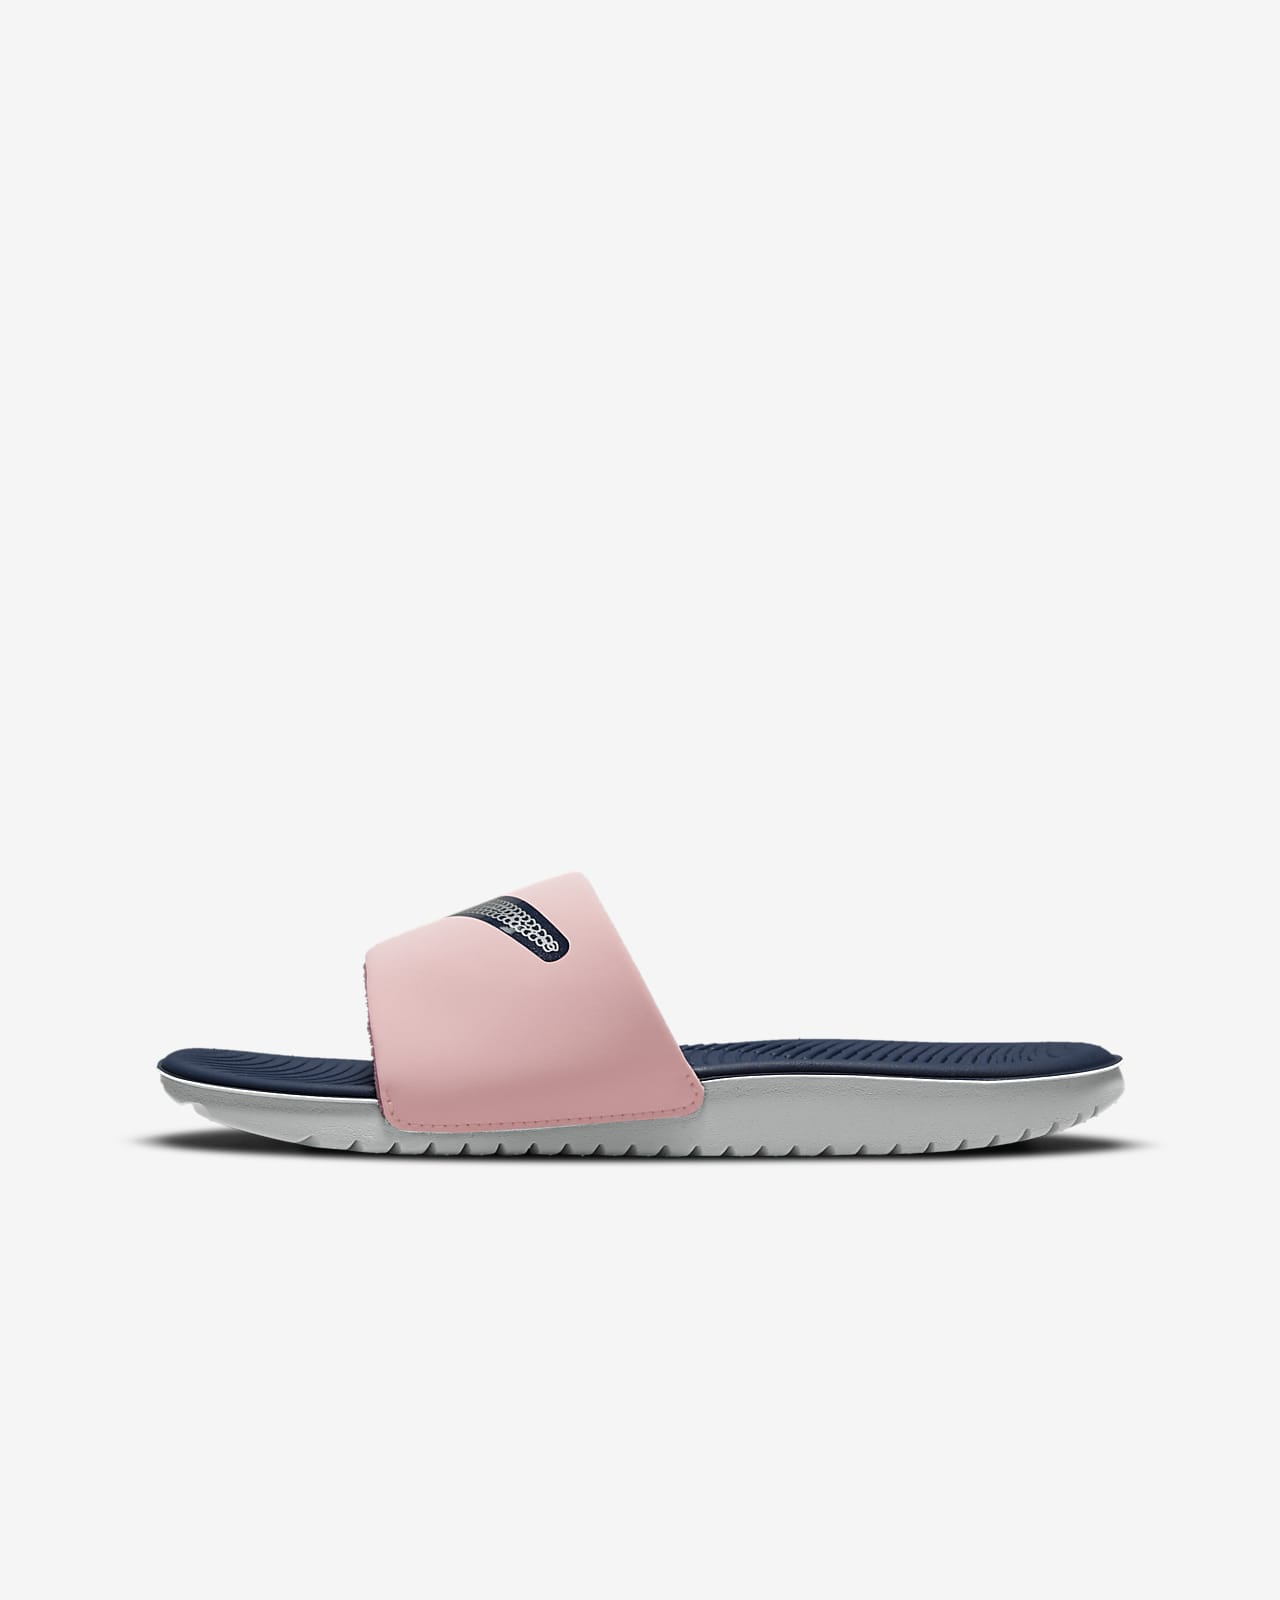 Nike Kawa SE Badeslipper für jüngere/ältere Kinder